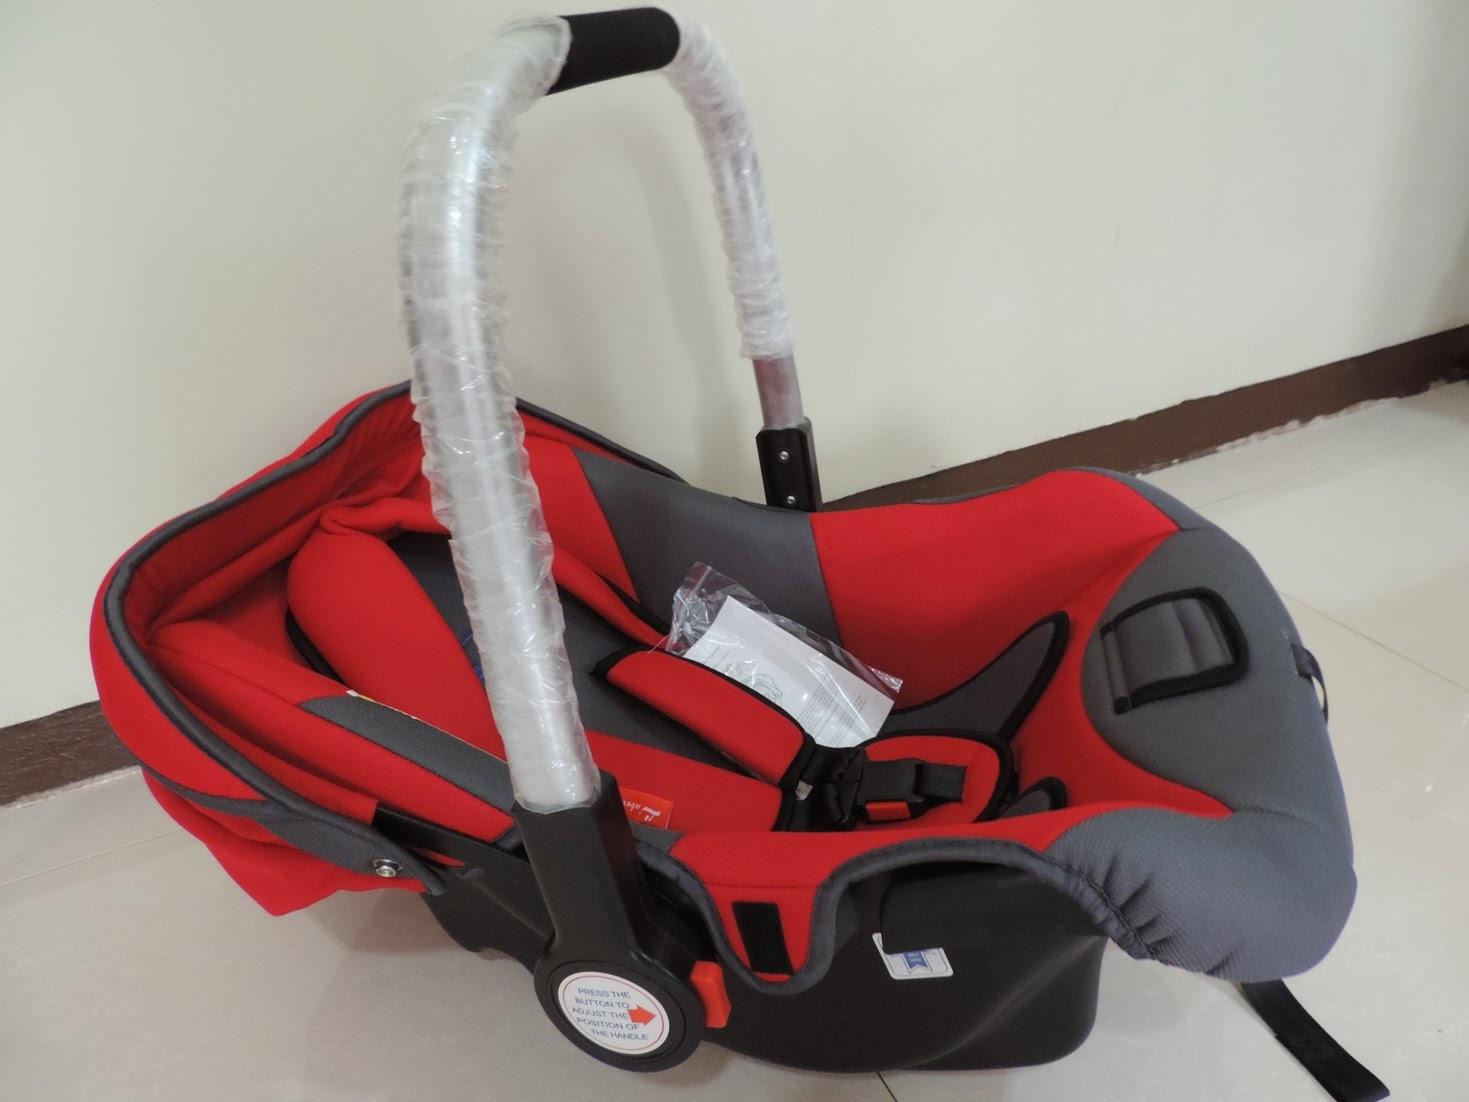 Labeille Baby Car Seat Toybox Rental Sewa Mainan Dan